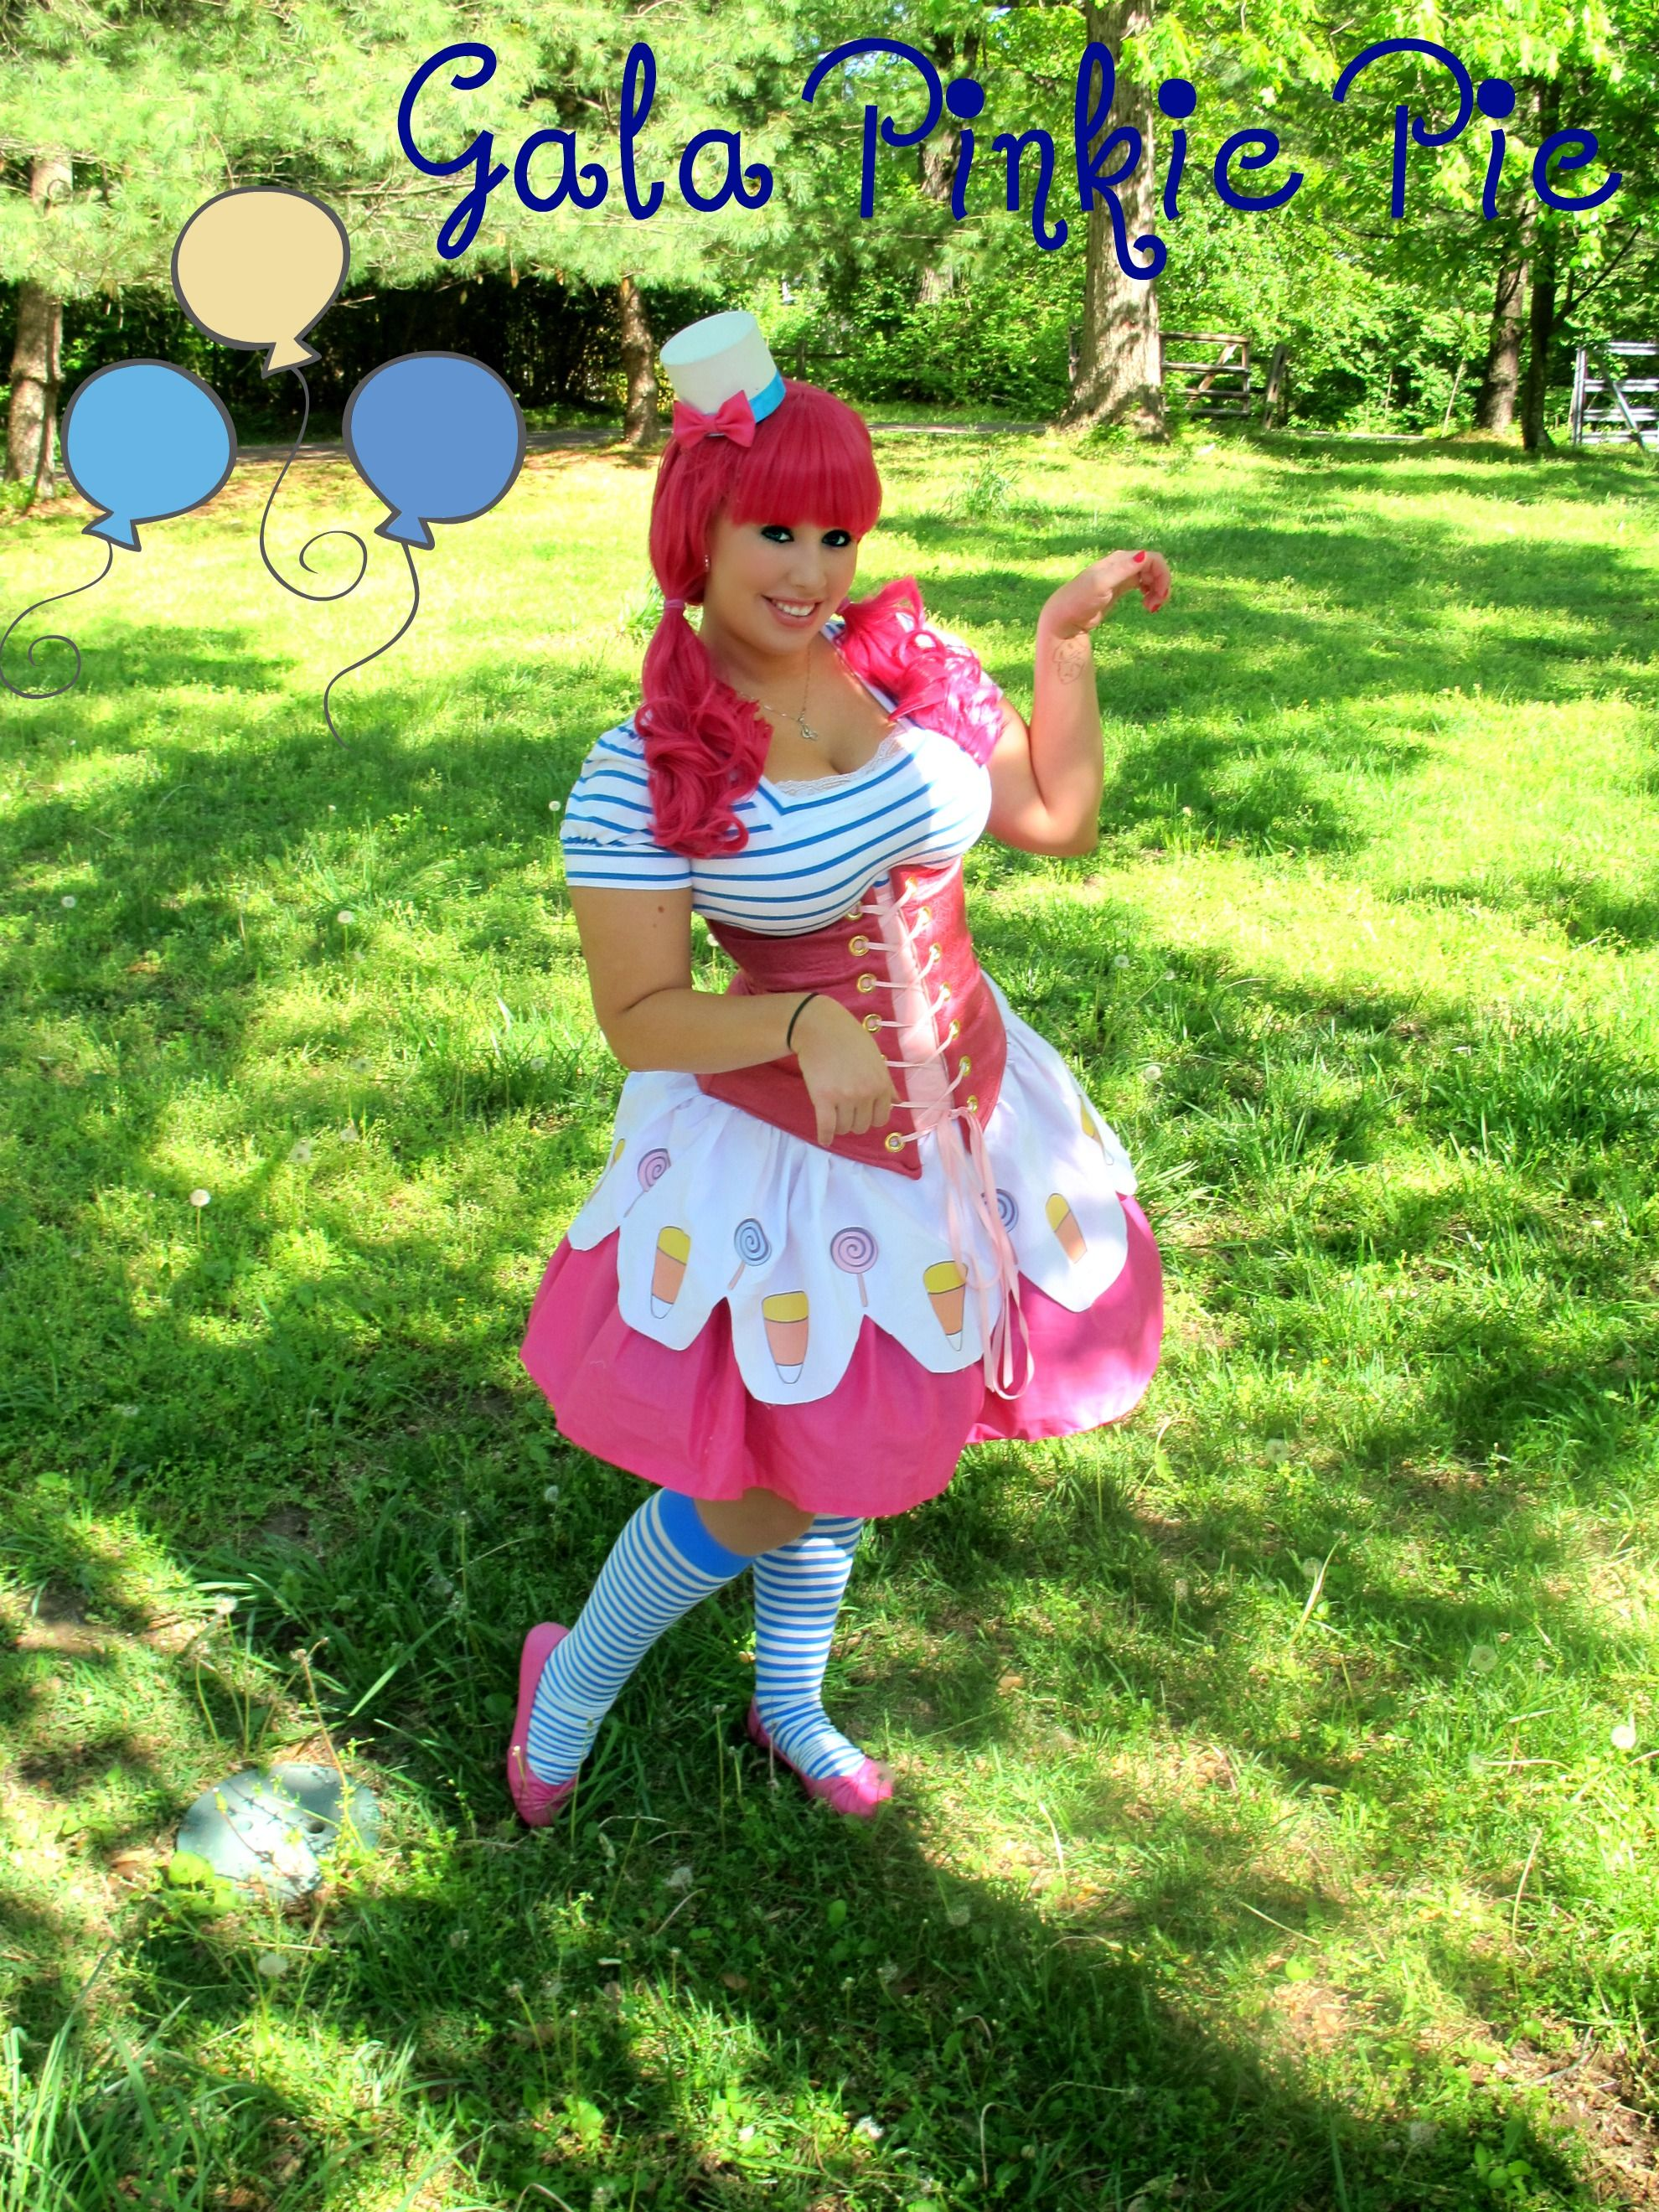 Pony Costume Ideas Pinkie Pie Cosplay Bewitchedravens Cosplay Pinterest Pinkie